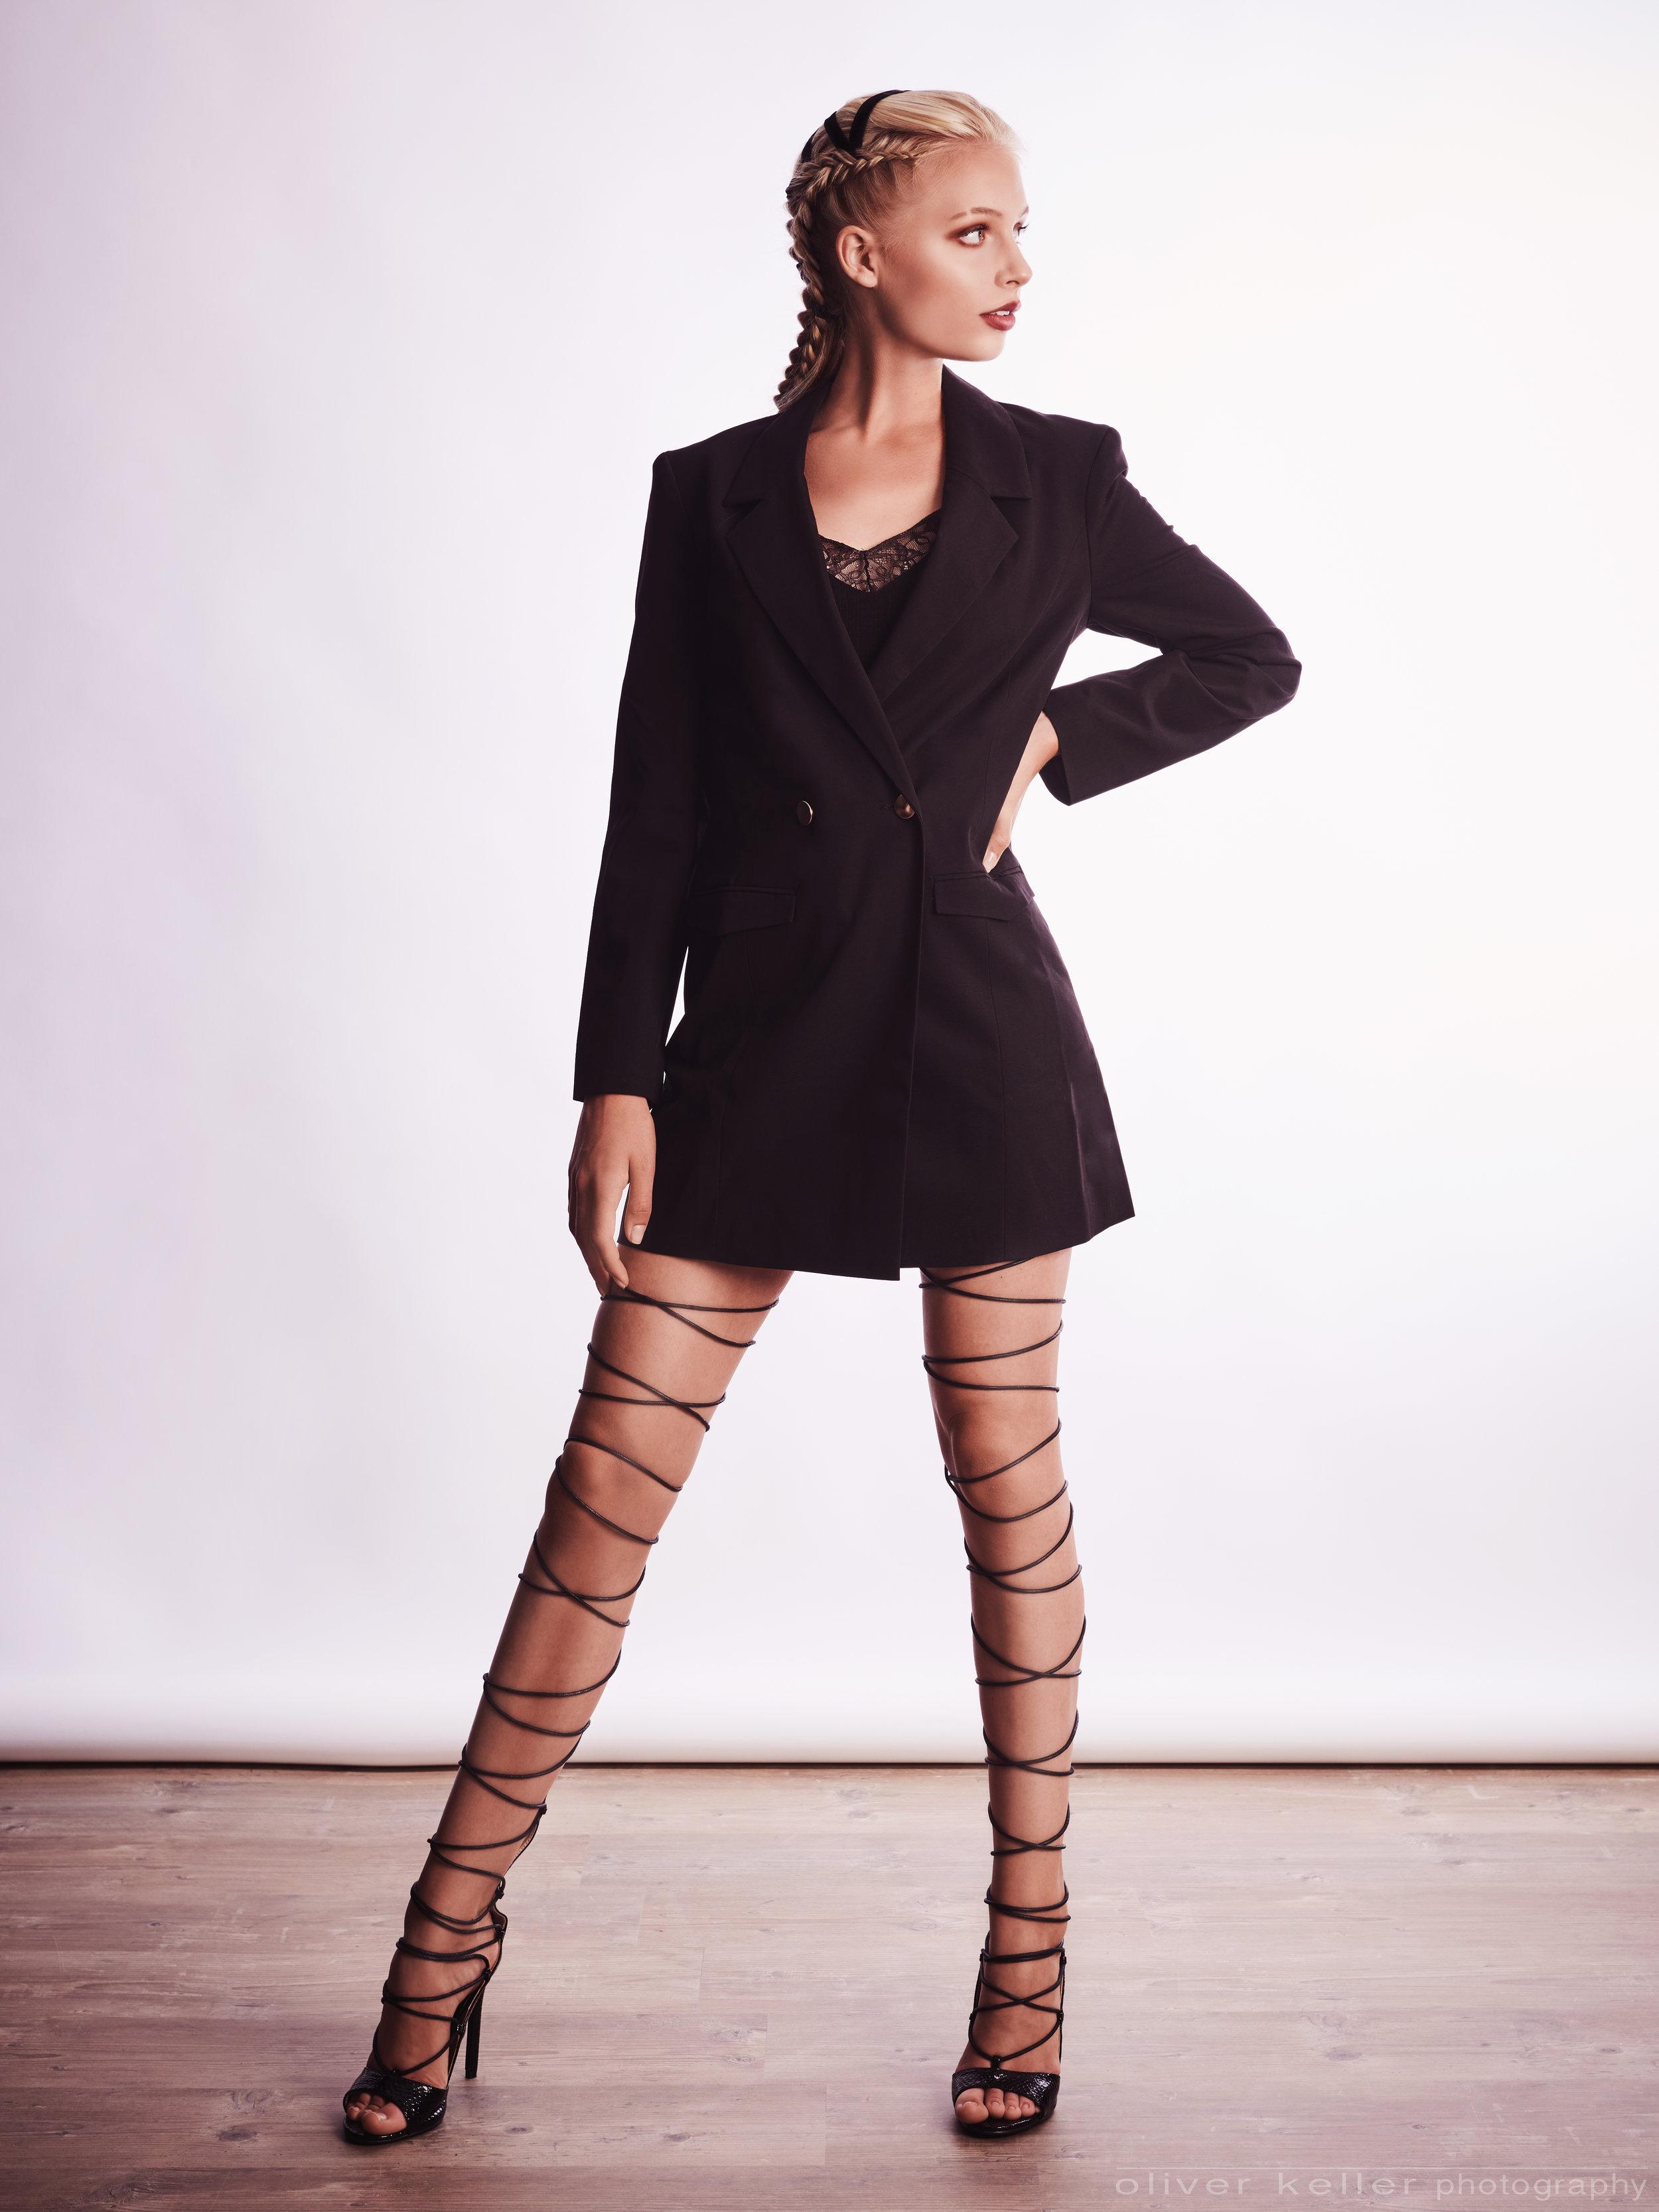 2018-07-04-Leony-dressed-in-black18057.jpg